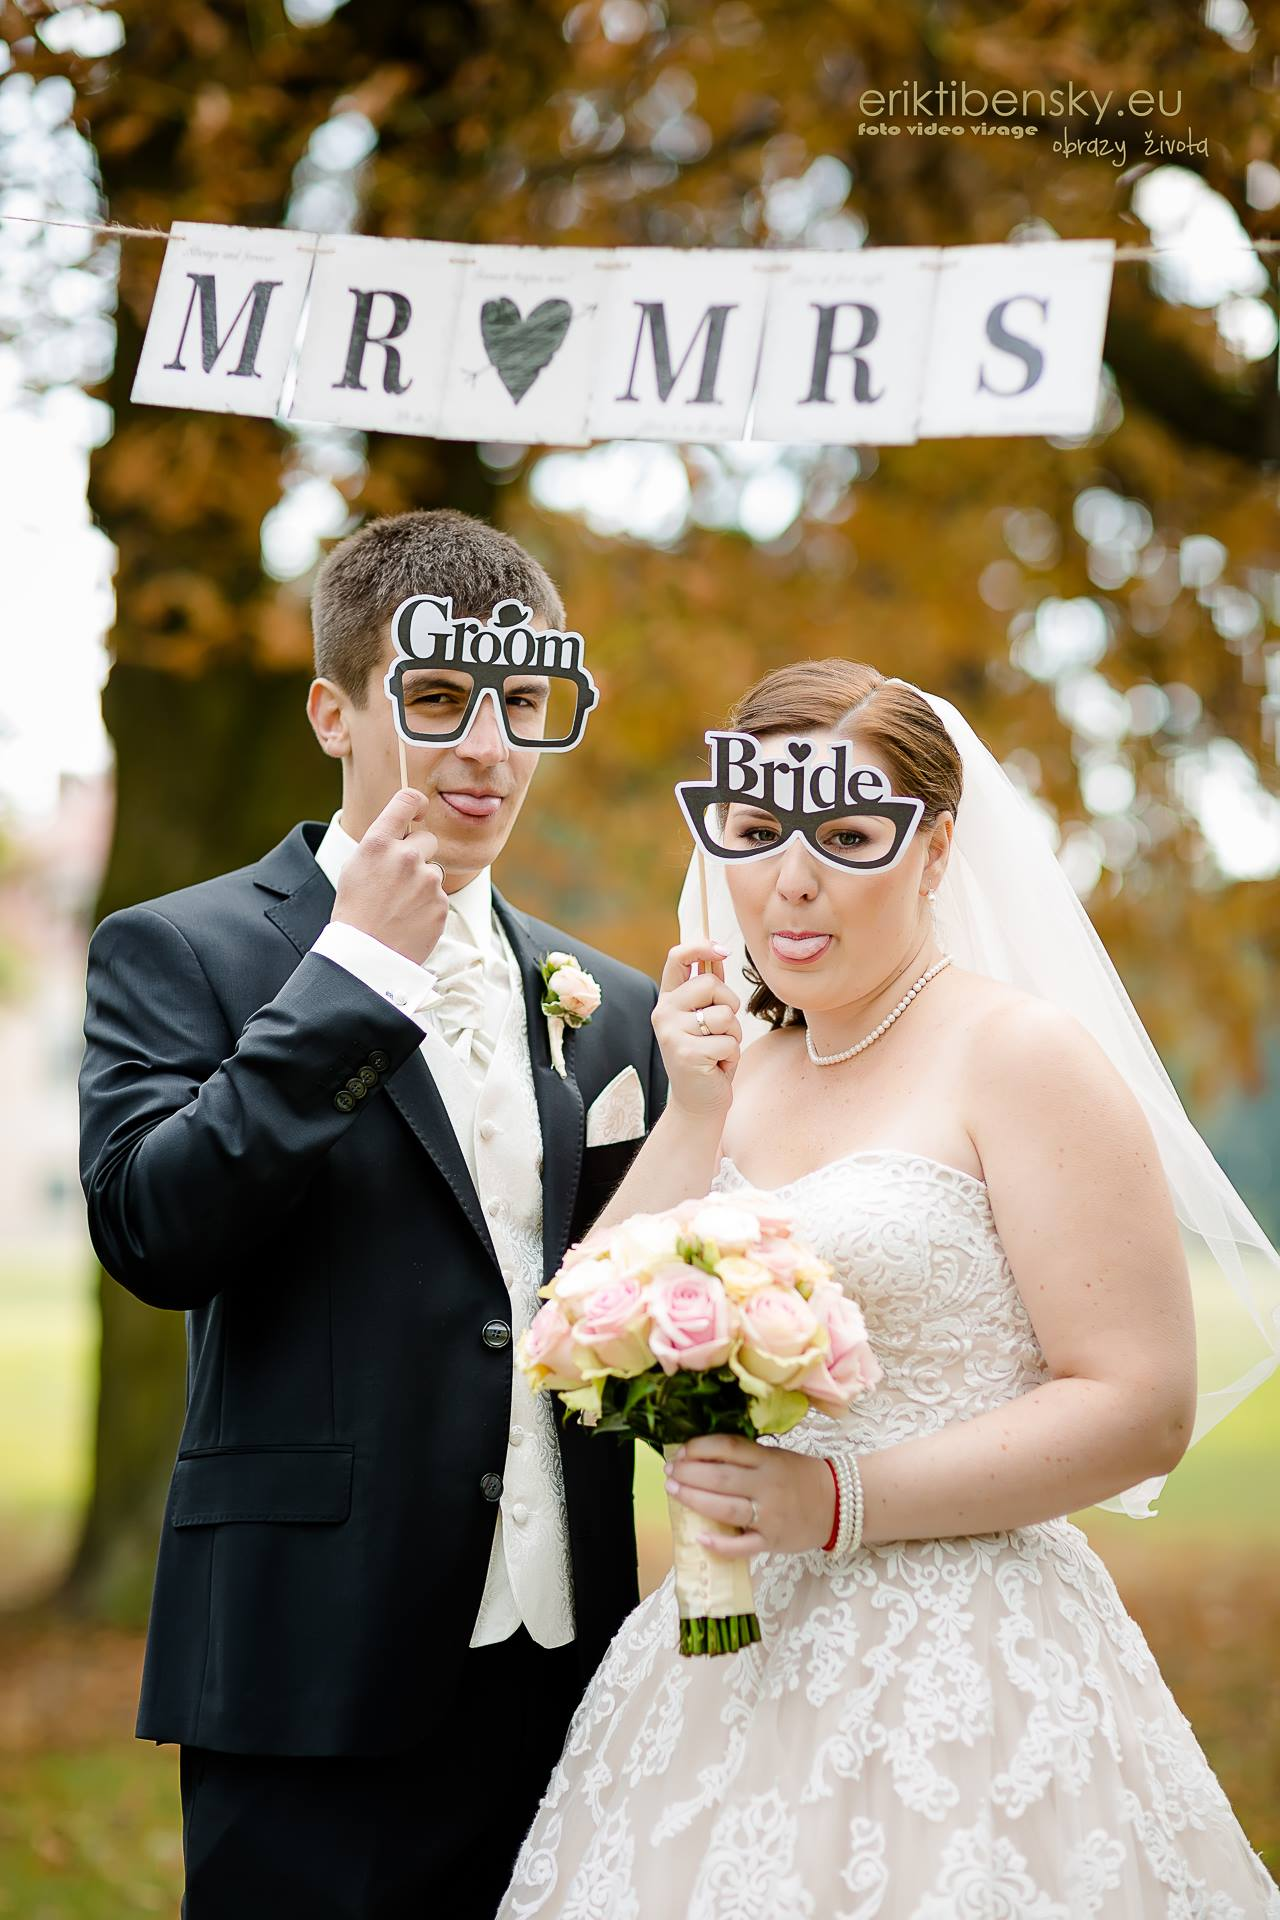 eriktibensky-eu-svadobny-fotograf-wedding-photographer-3090